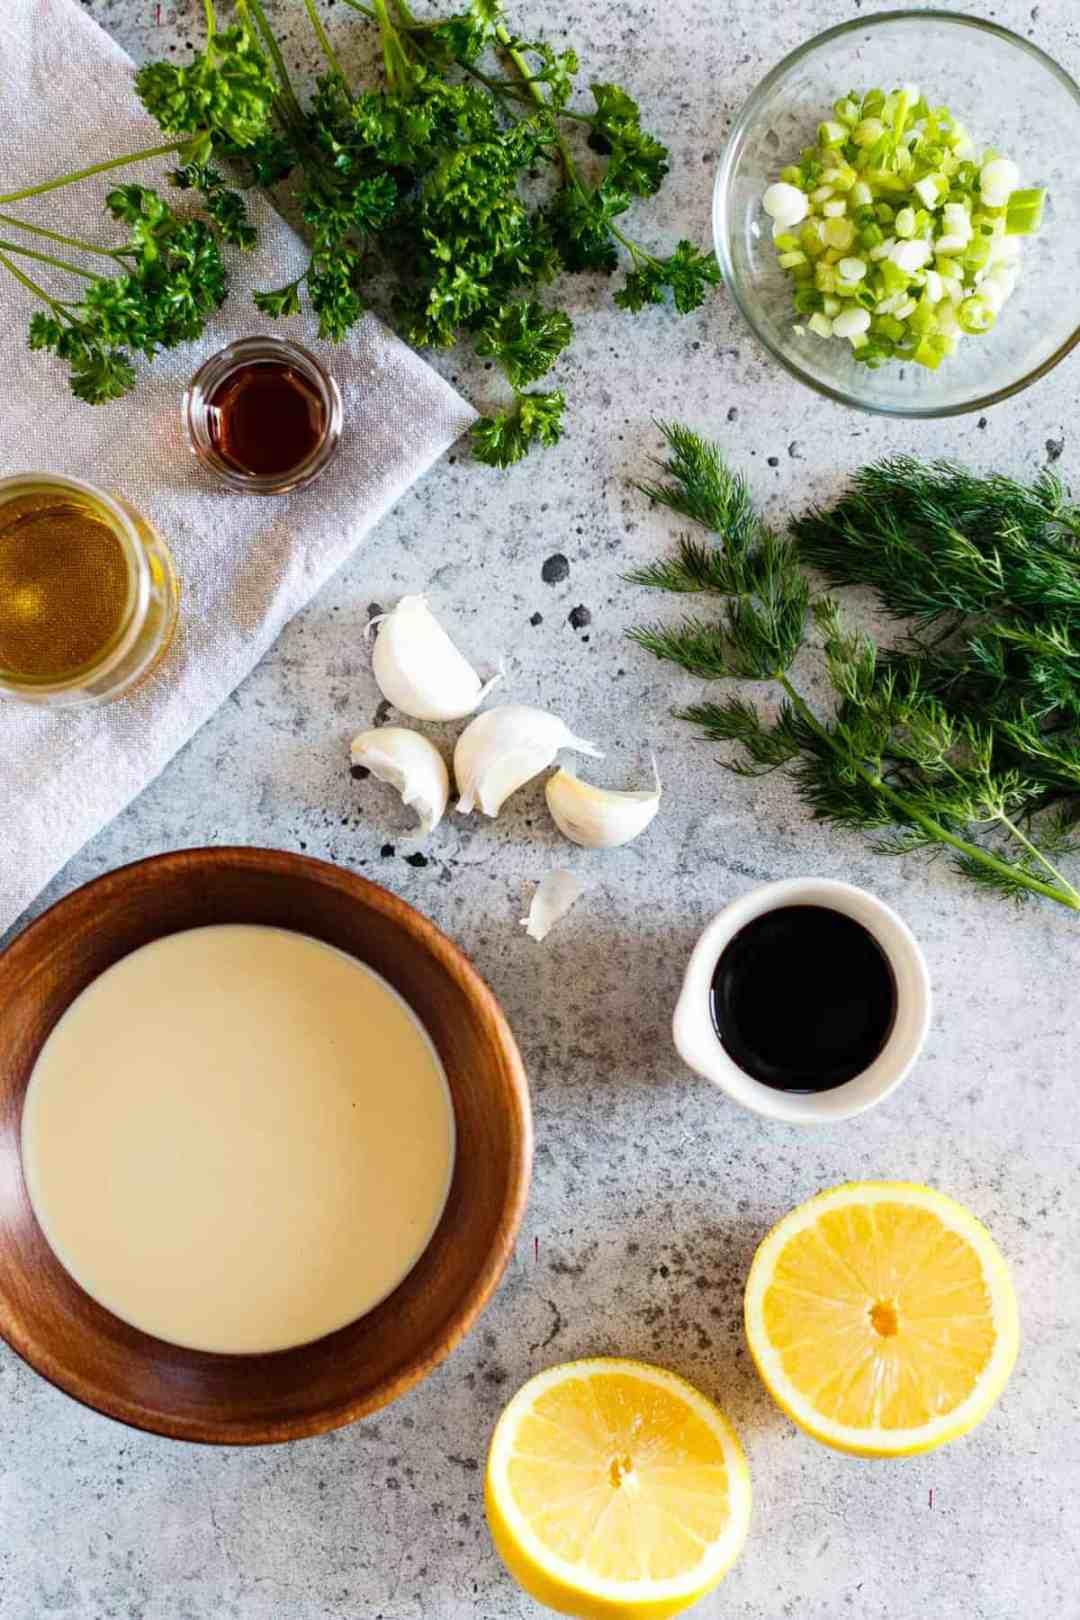 Ingredients for Vegan Tahini Goddess Dressing